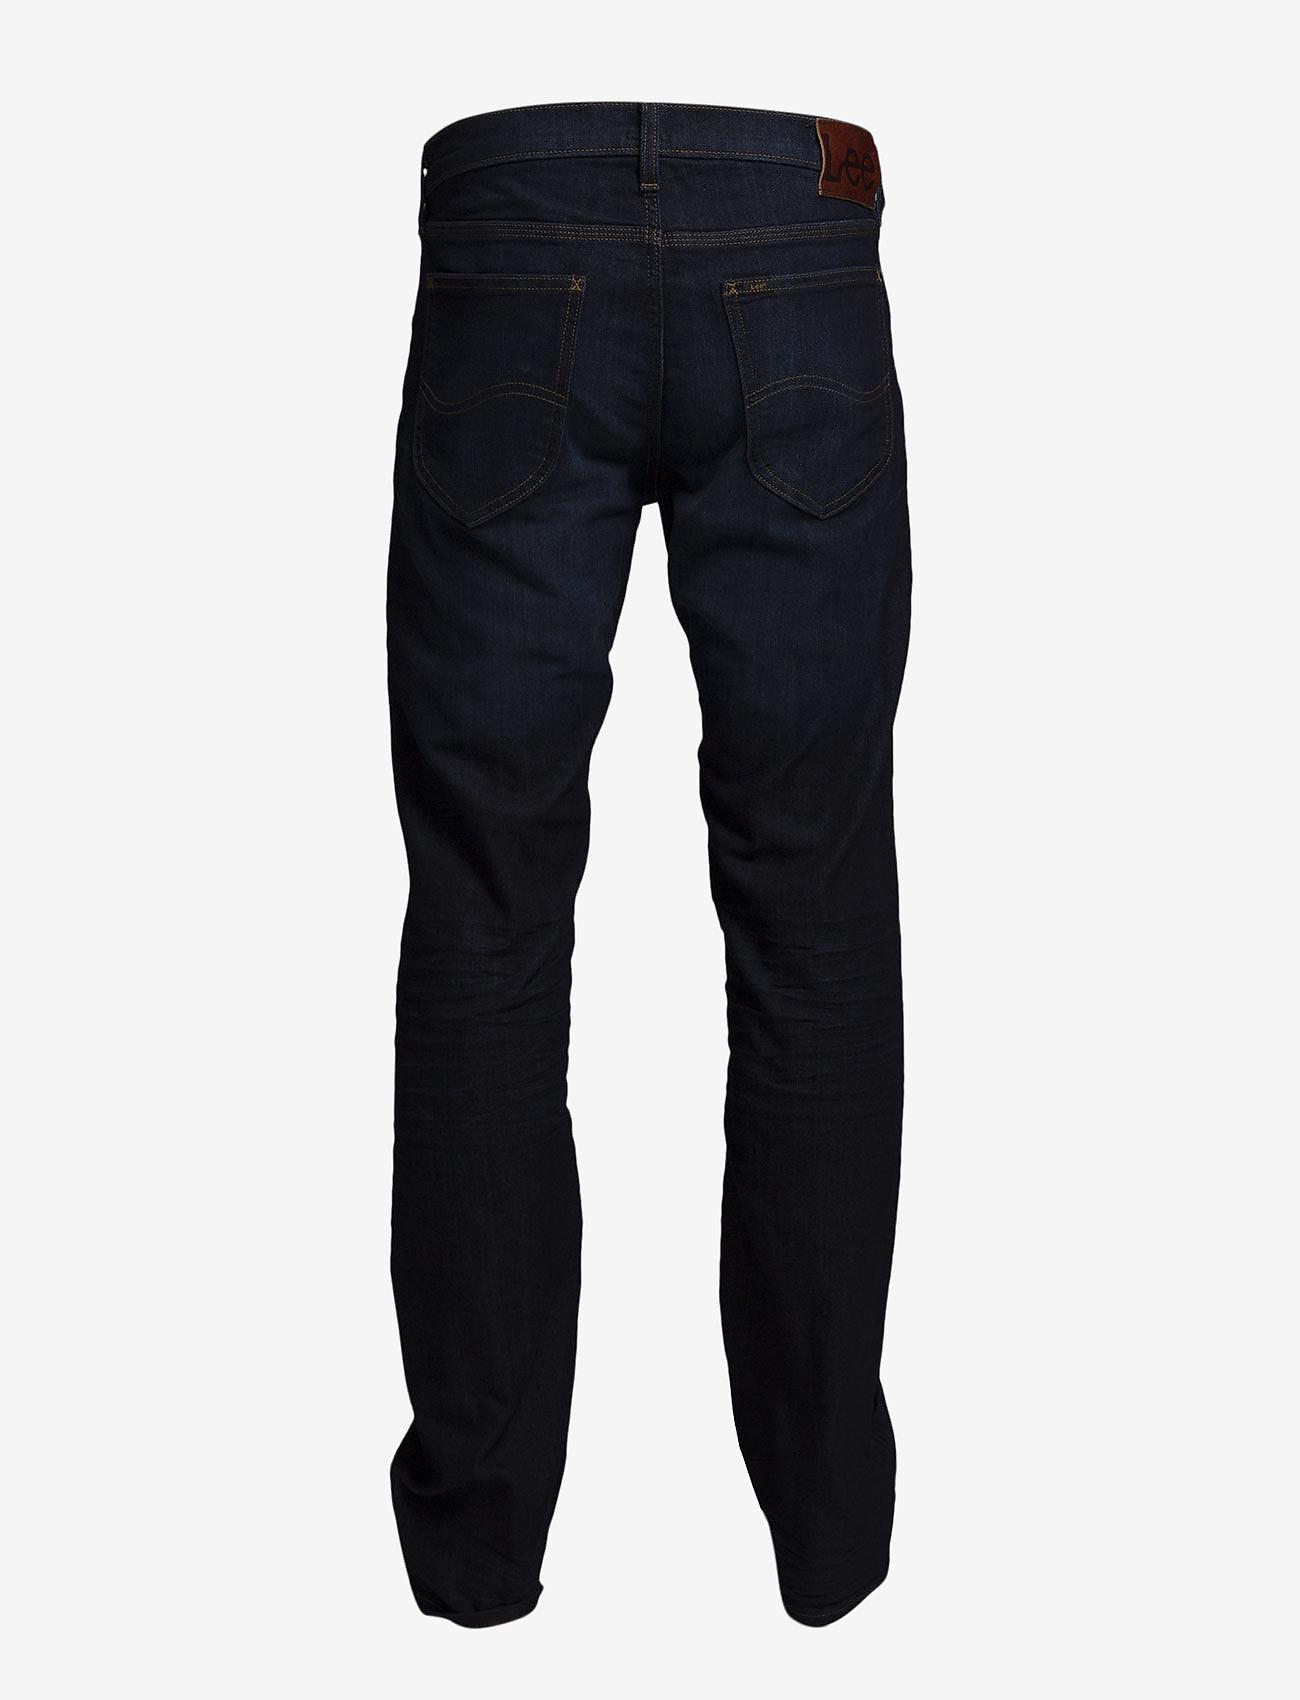 Lee Jeans - DAREN BUTTON FLY - regular jeans - strong hand - 1